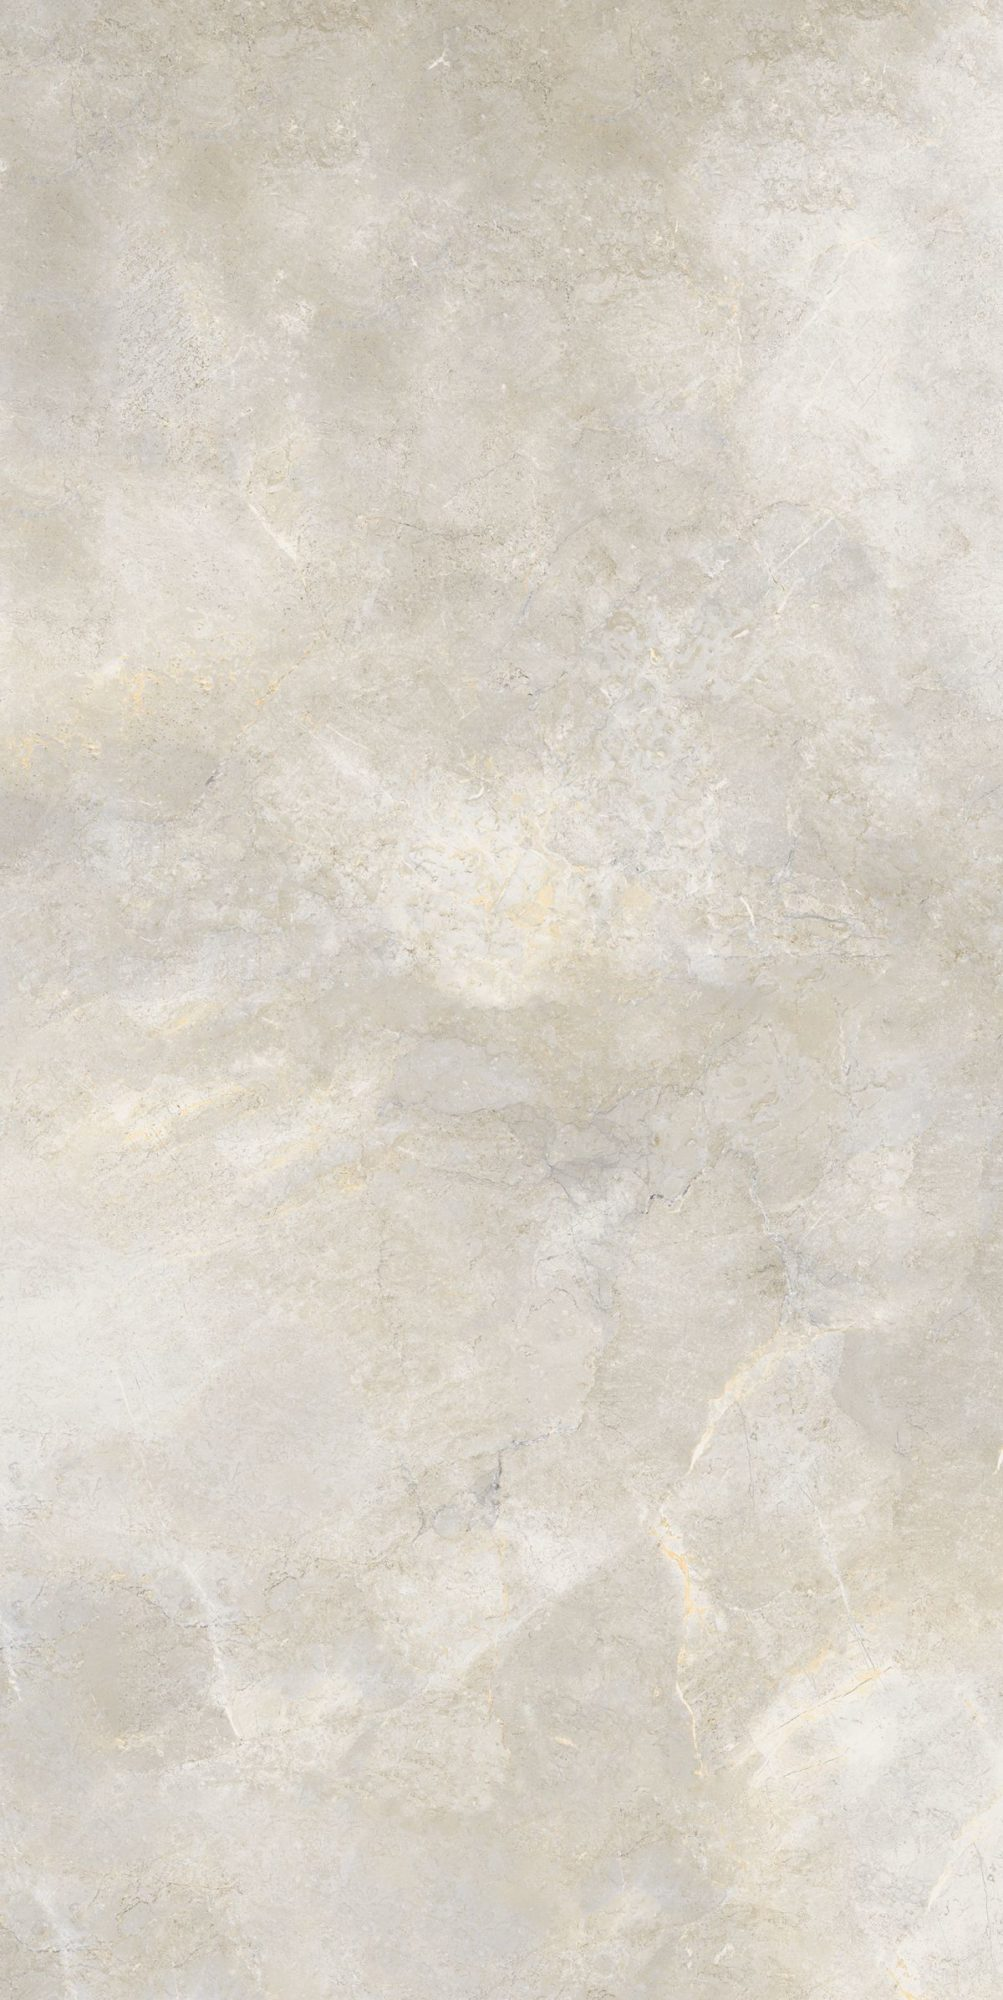 08_porcelaingres_great_royal_stone_platinum-white-150x300-6mm.jpg